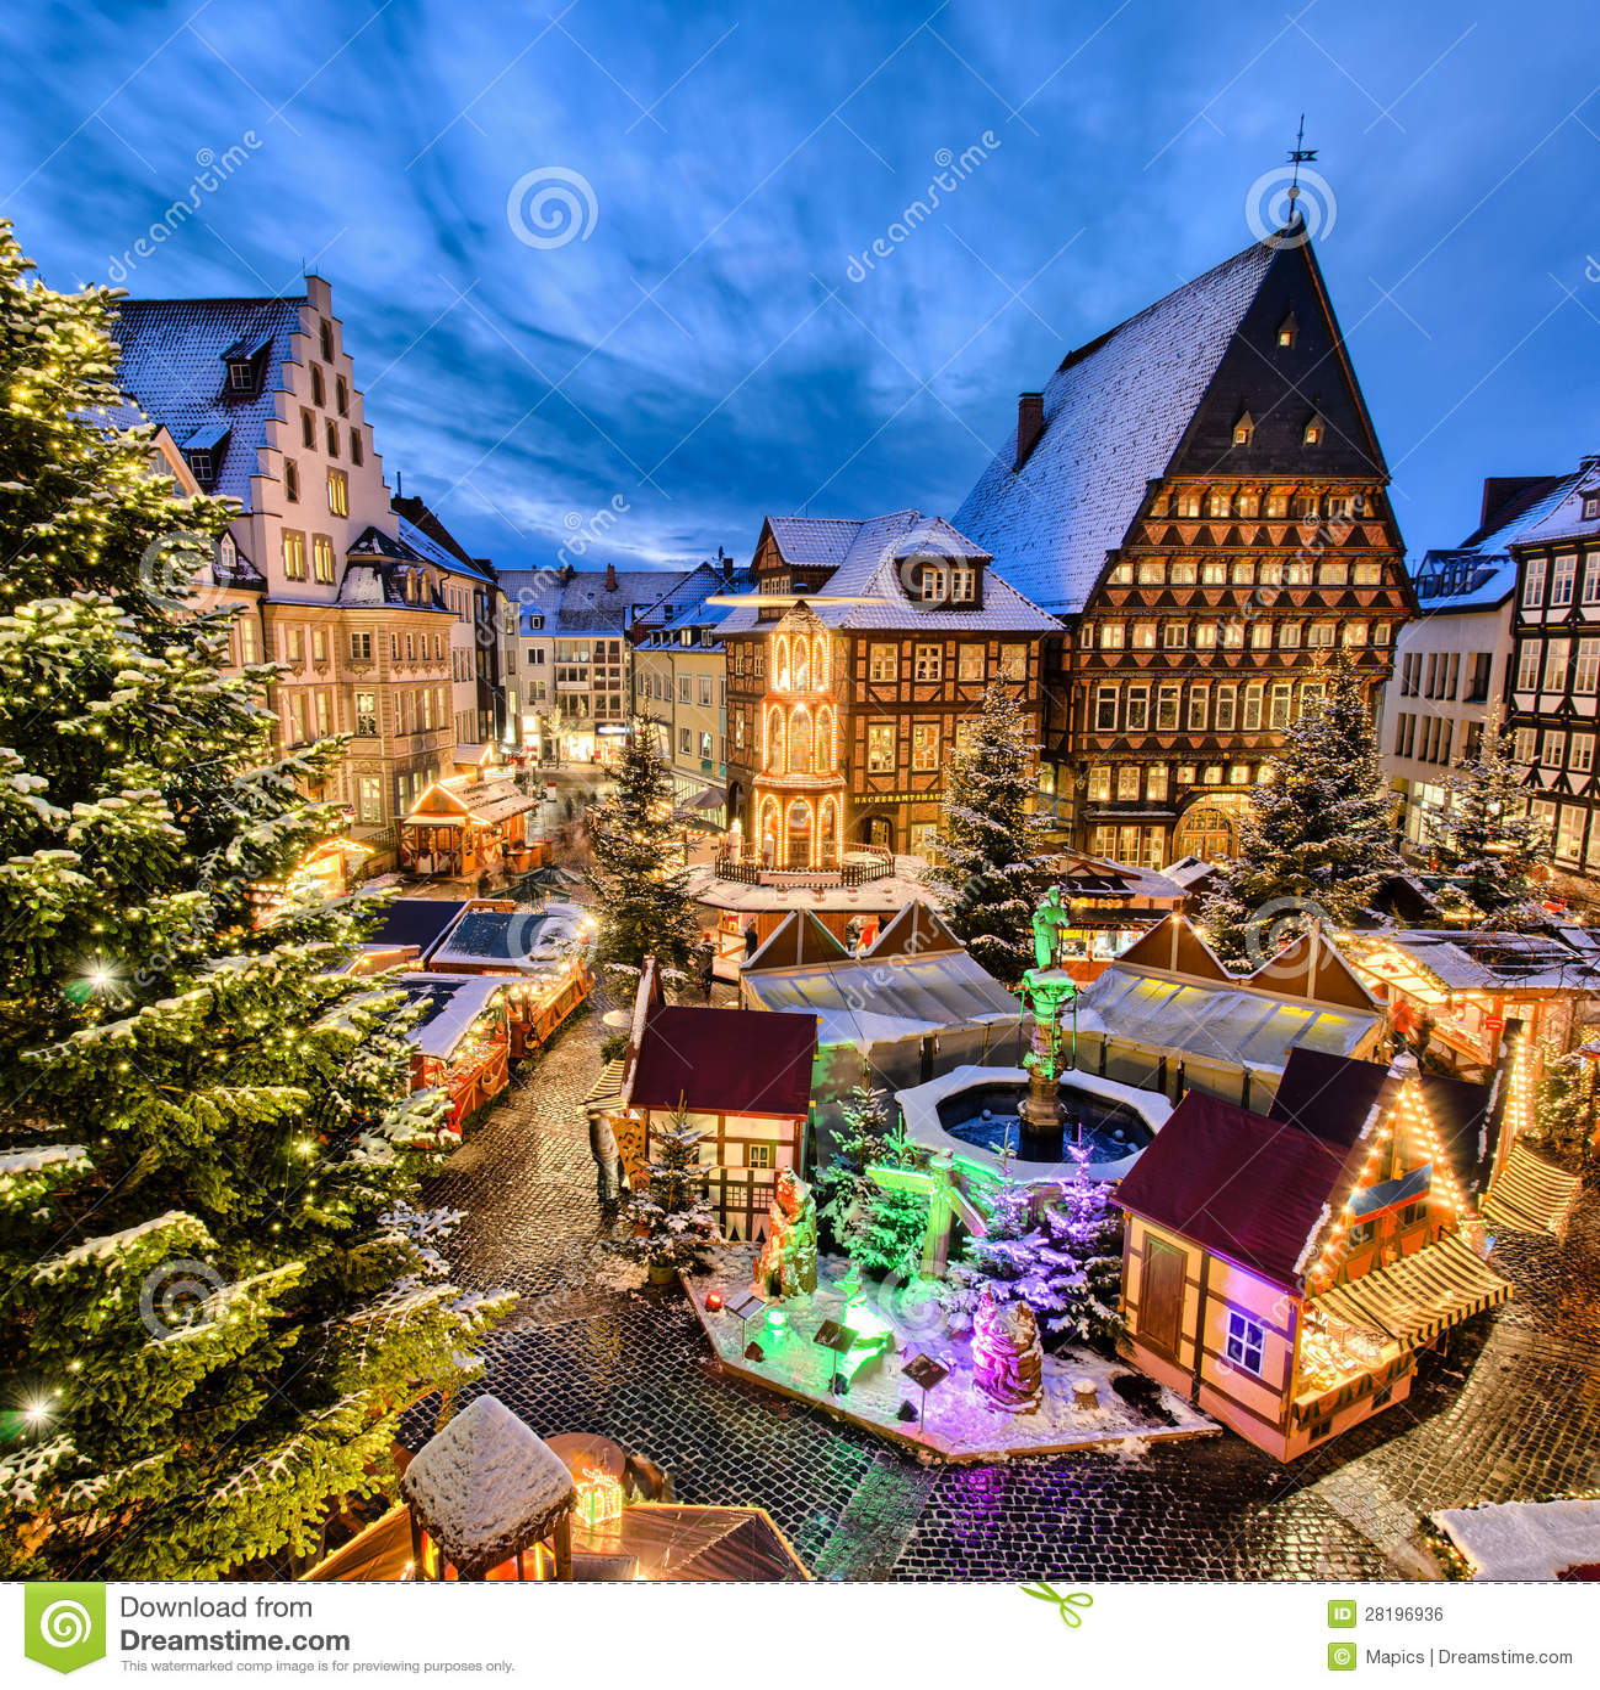 Christmas Market In Hildesheim Germany Royalty Free Stock